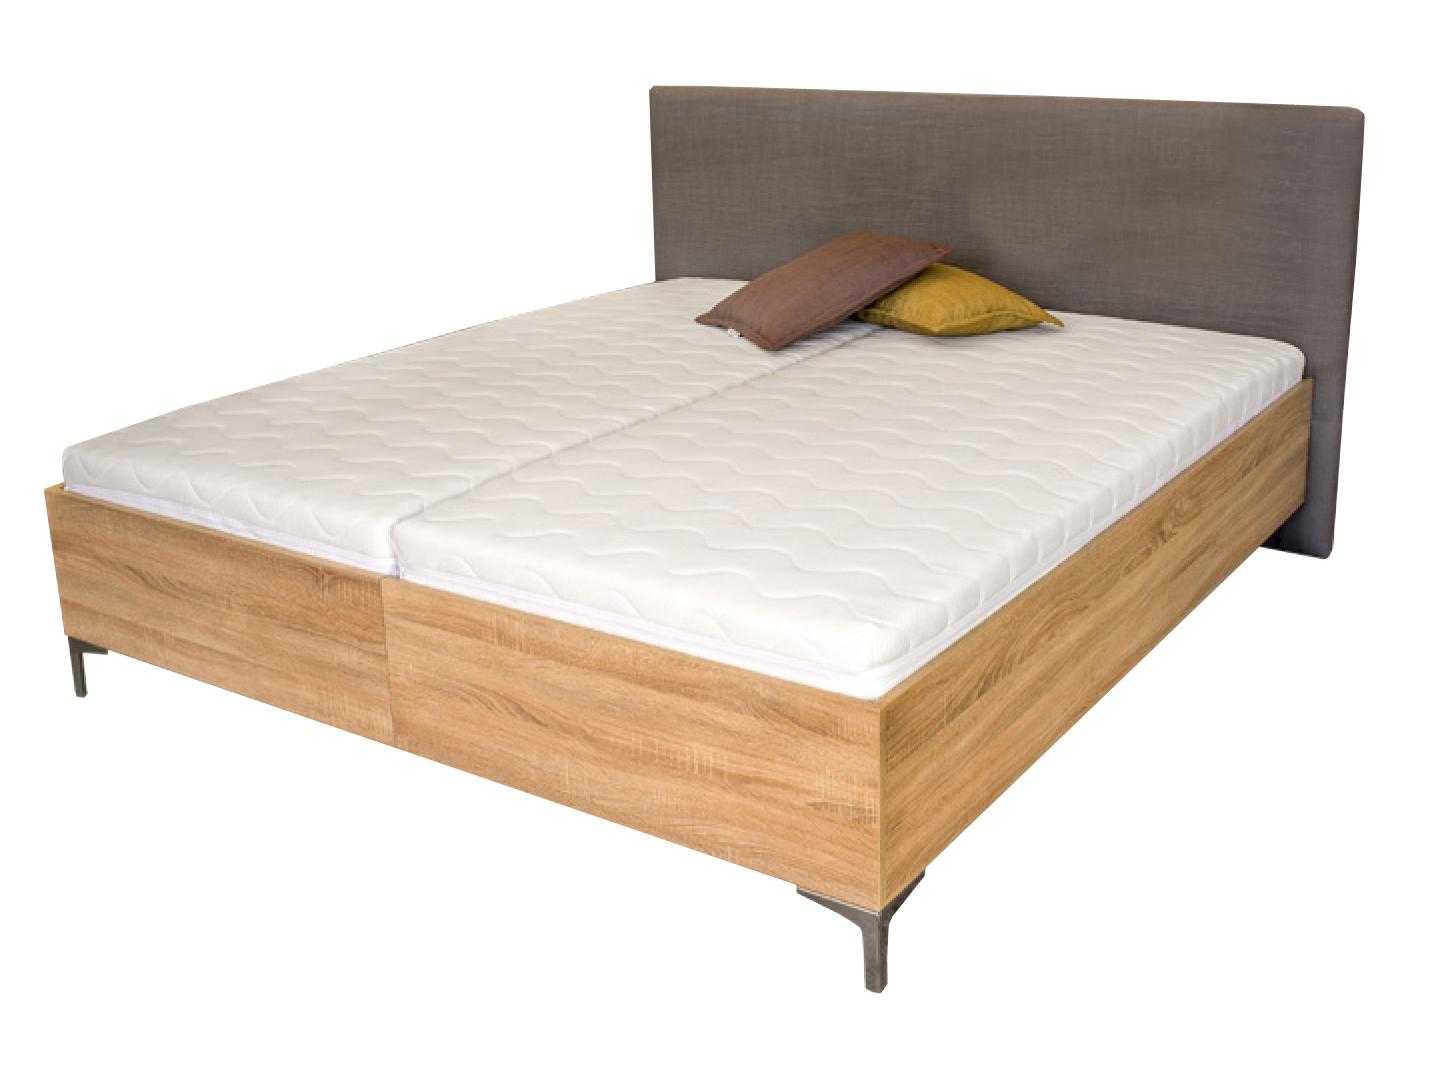 Manželská postel 180 cm - Benab - Ferrera Wood (s rošty)